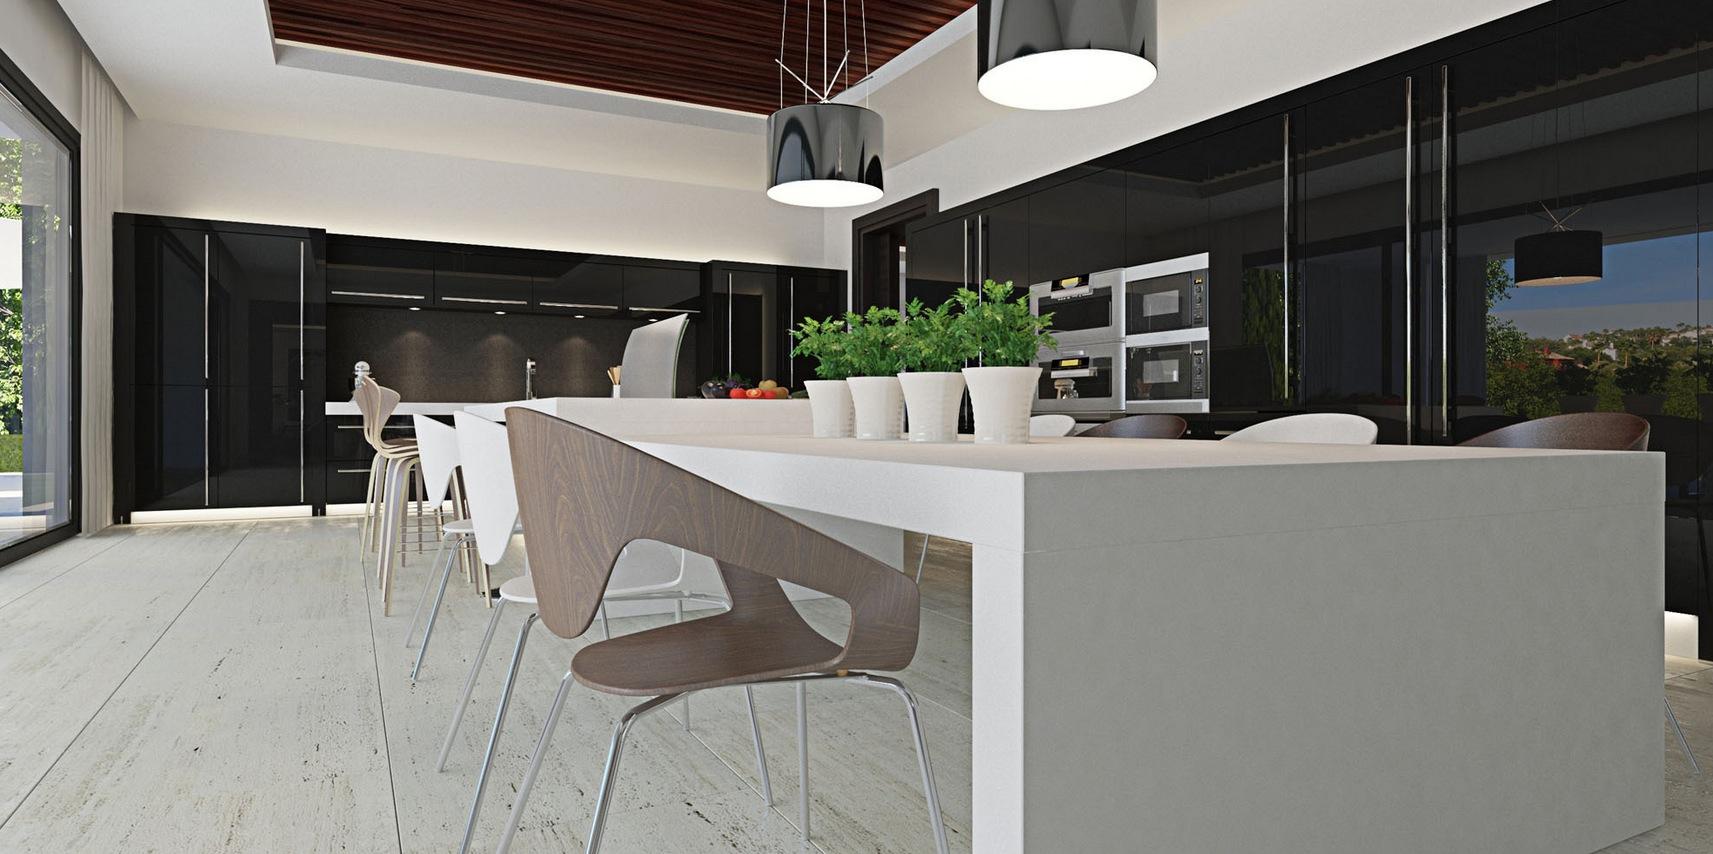 Luxurious 9 Bedroom Spanish Home With Indoor Amp Outdoor Pools